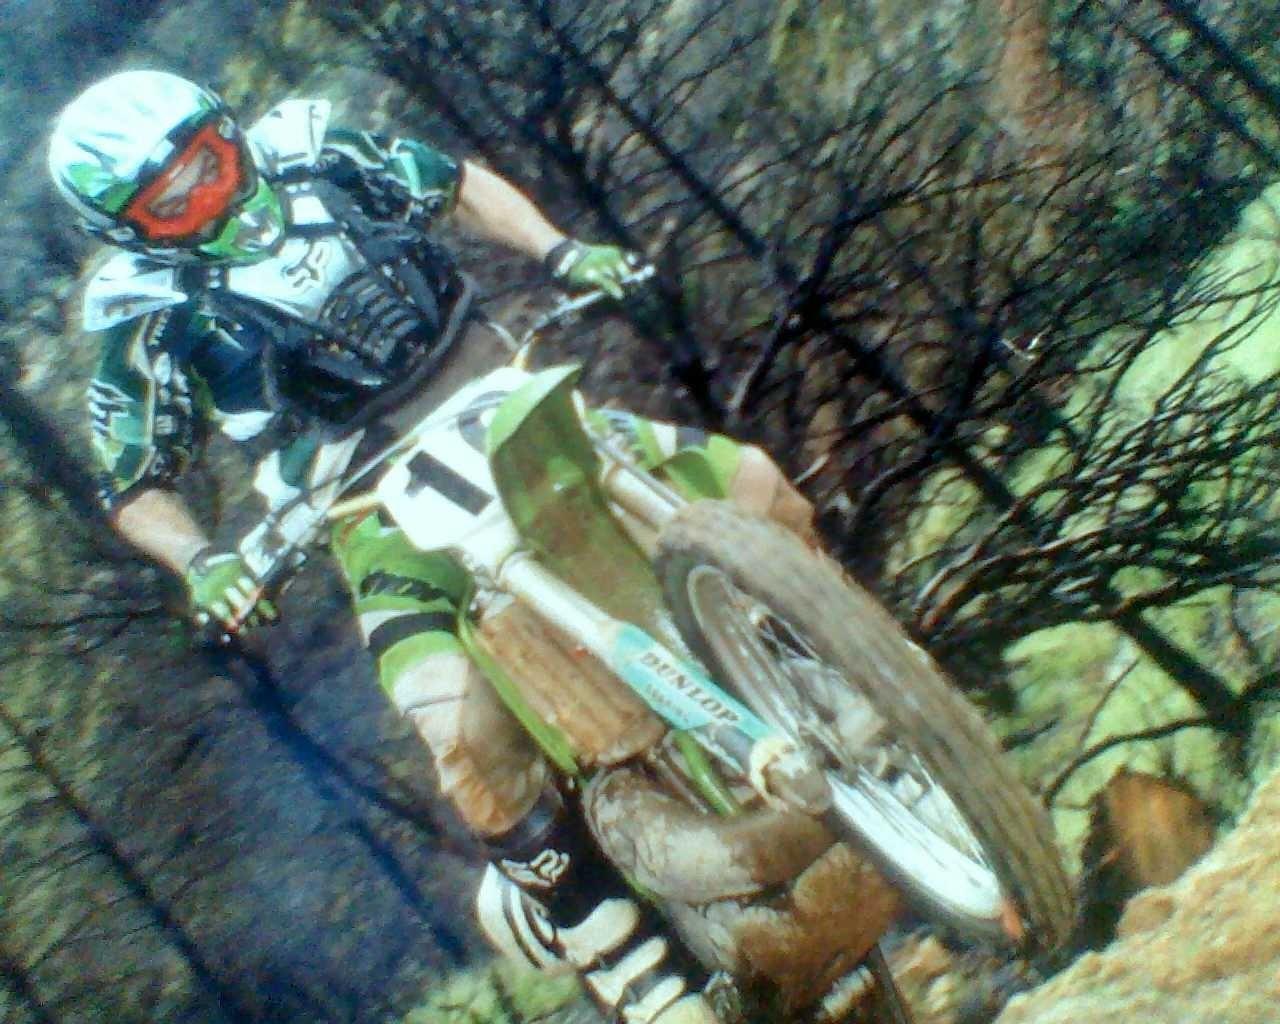 kx1 - gsxr6 - Motocross Pictures - Vital MX